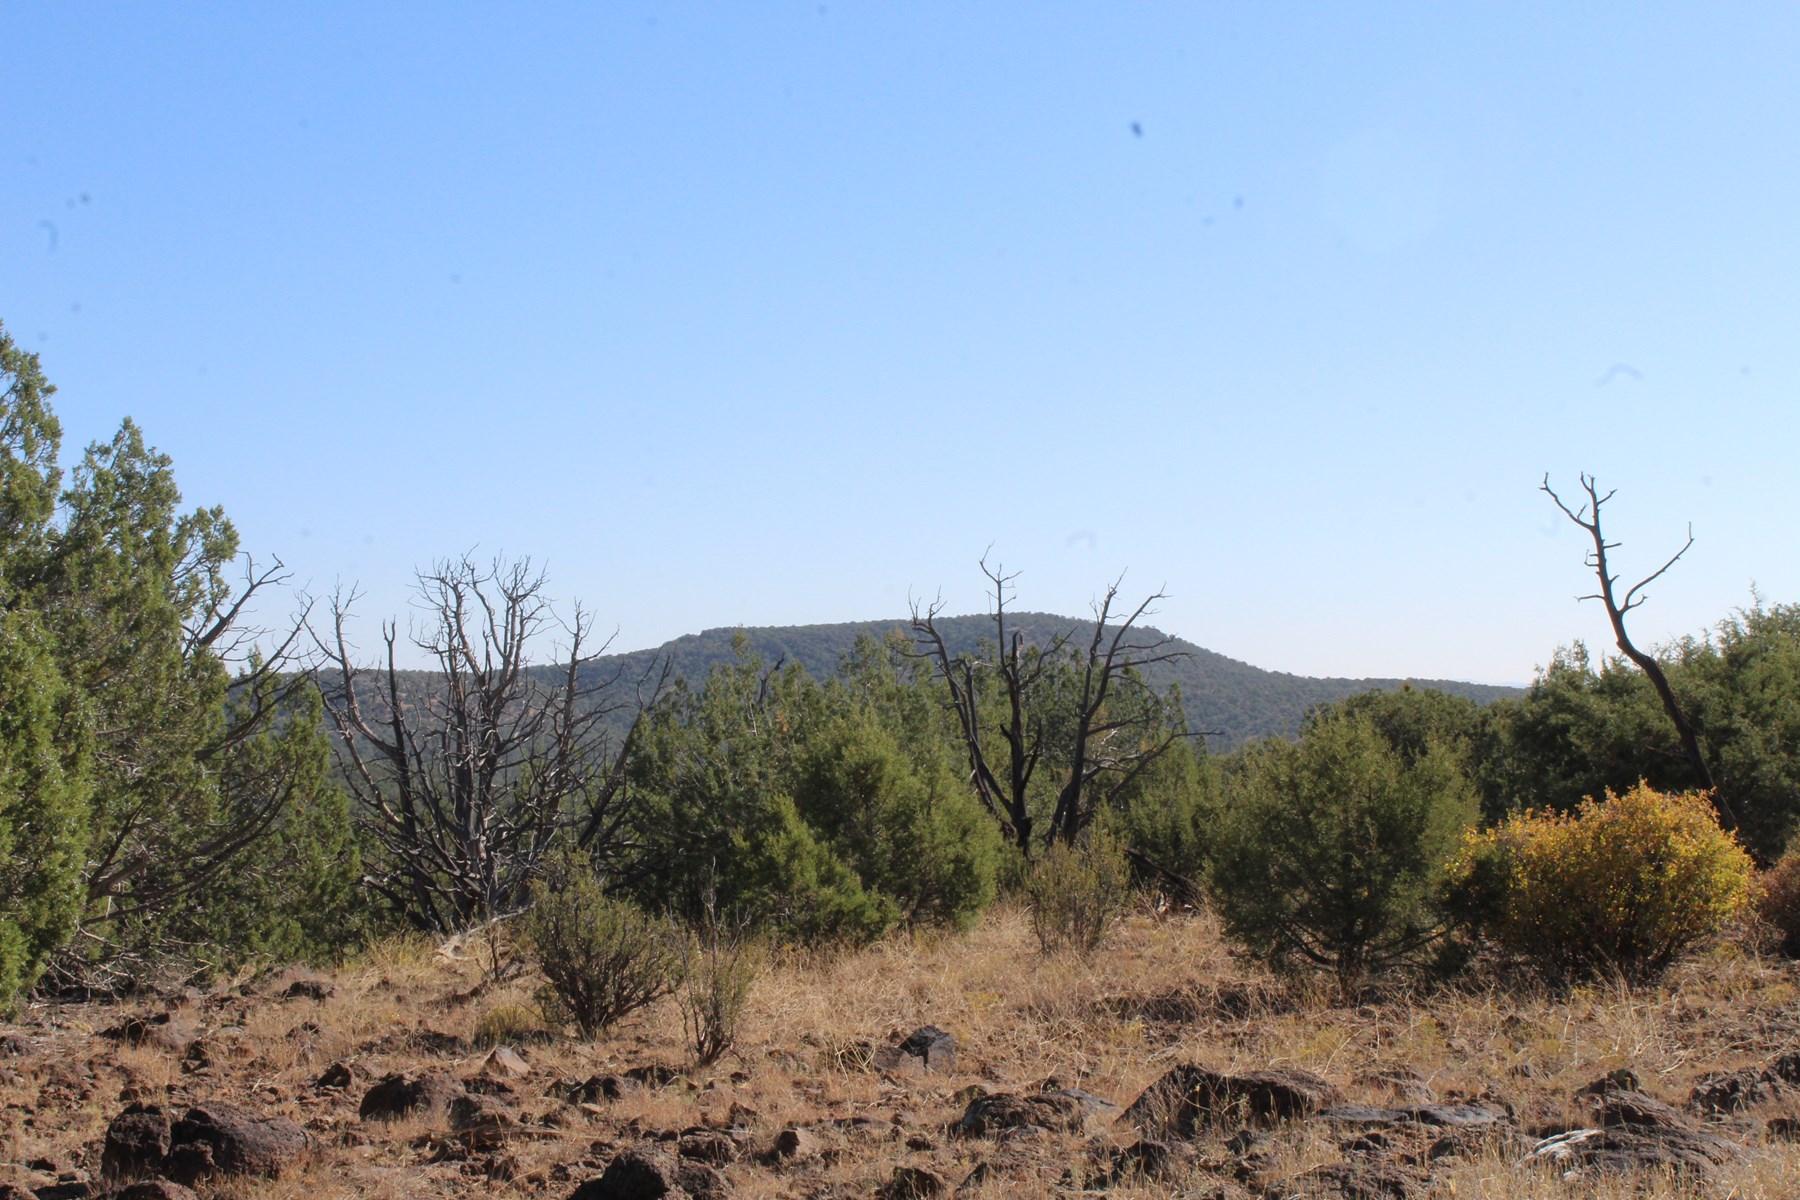 Large Land Borders Public Land on 2 Sides in Seligman aZ